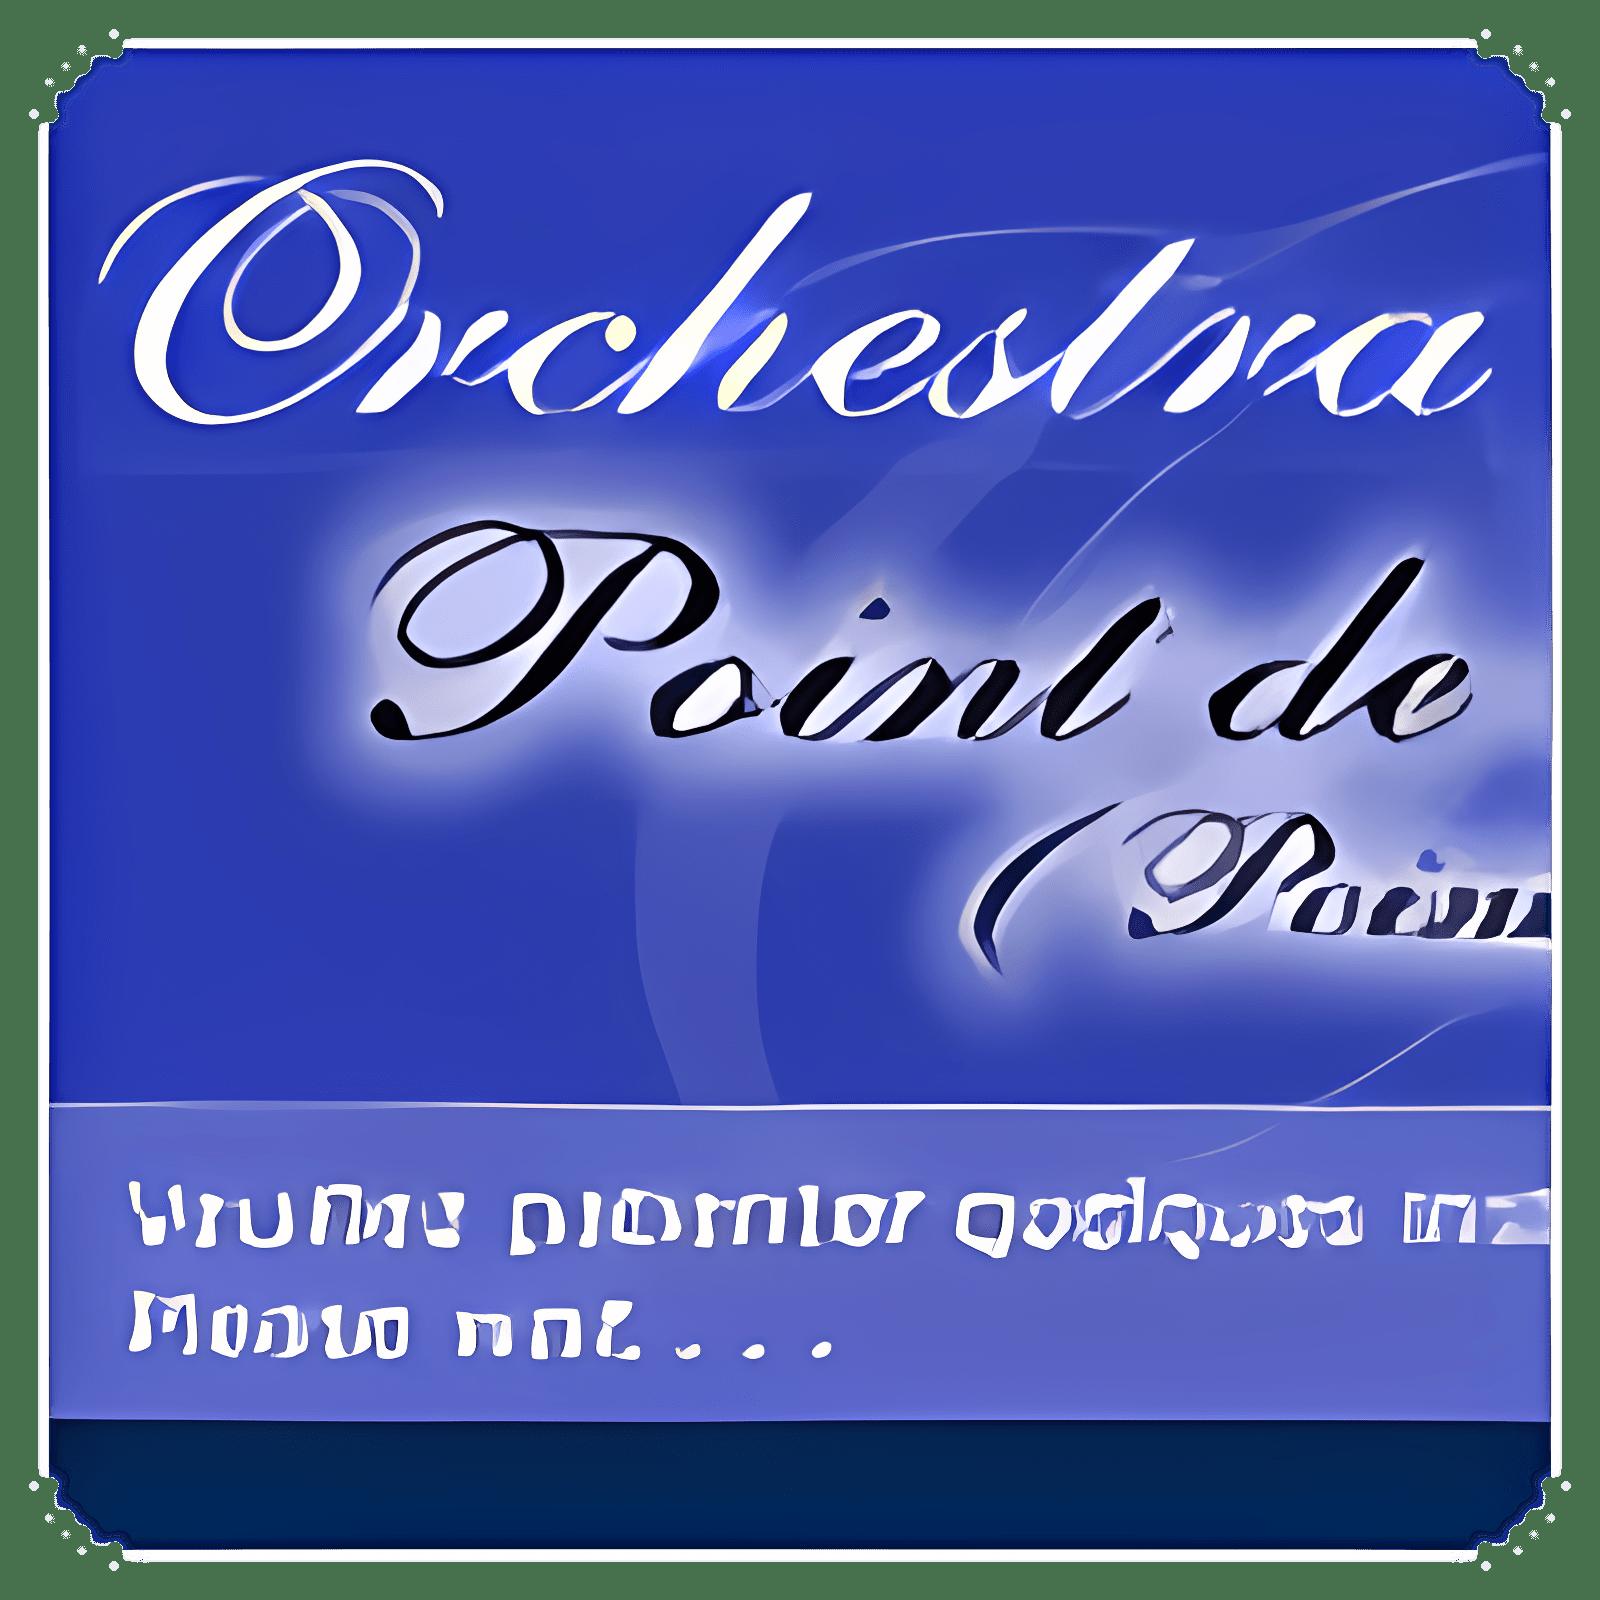 Orchestra Point de Vente